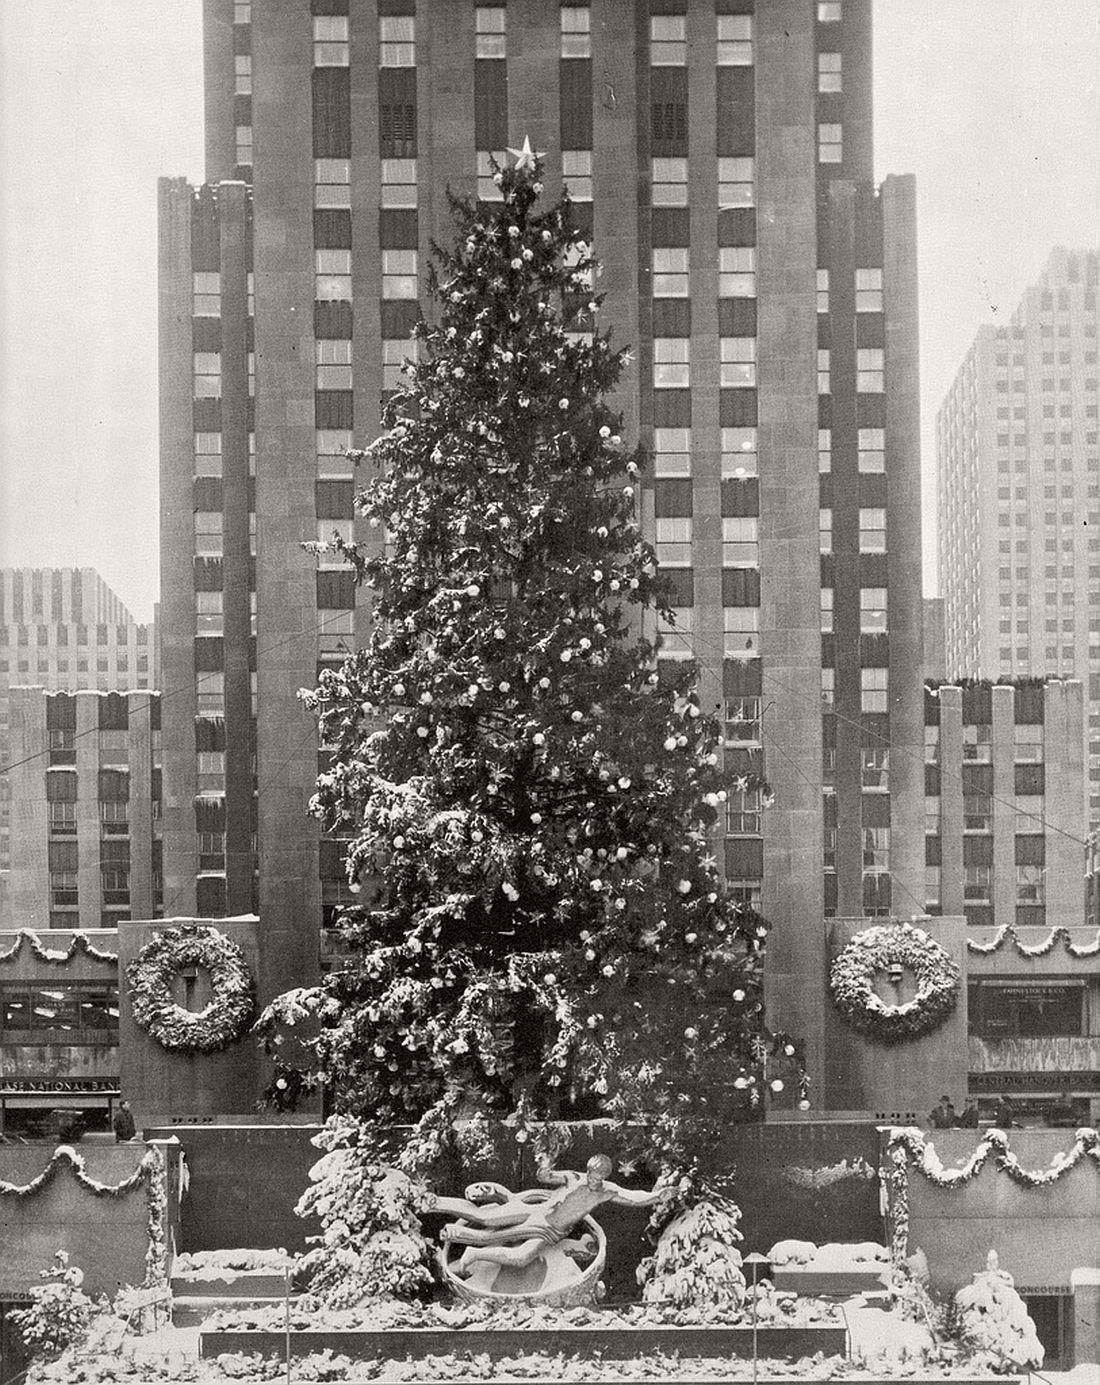 d9d52de1 1940: Vintage images of Rockefeller Center Christmas tree in New ...